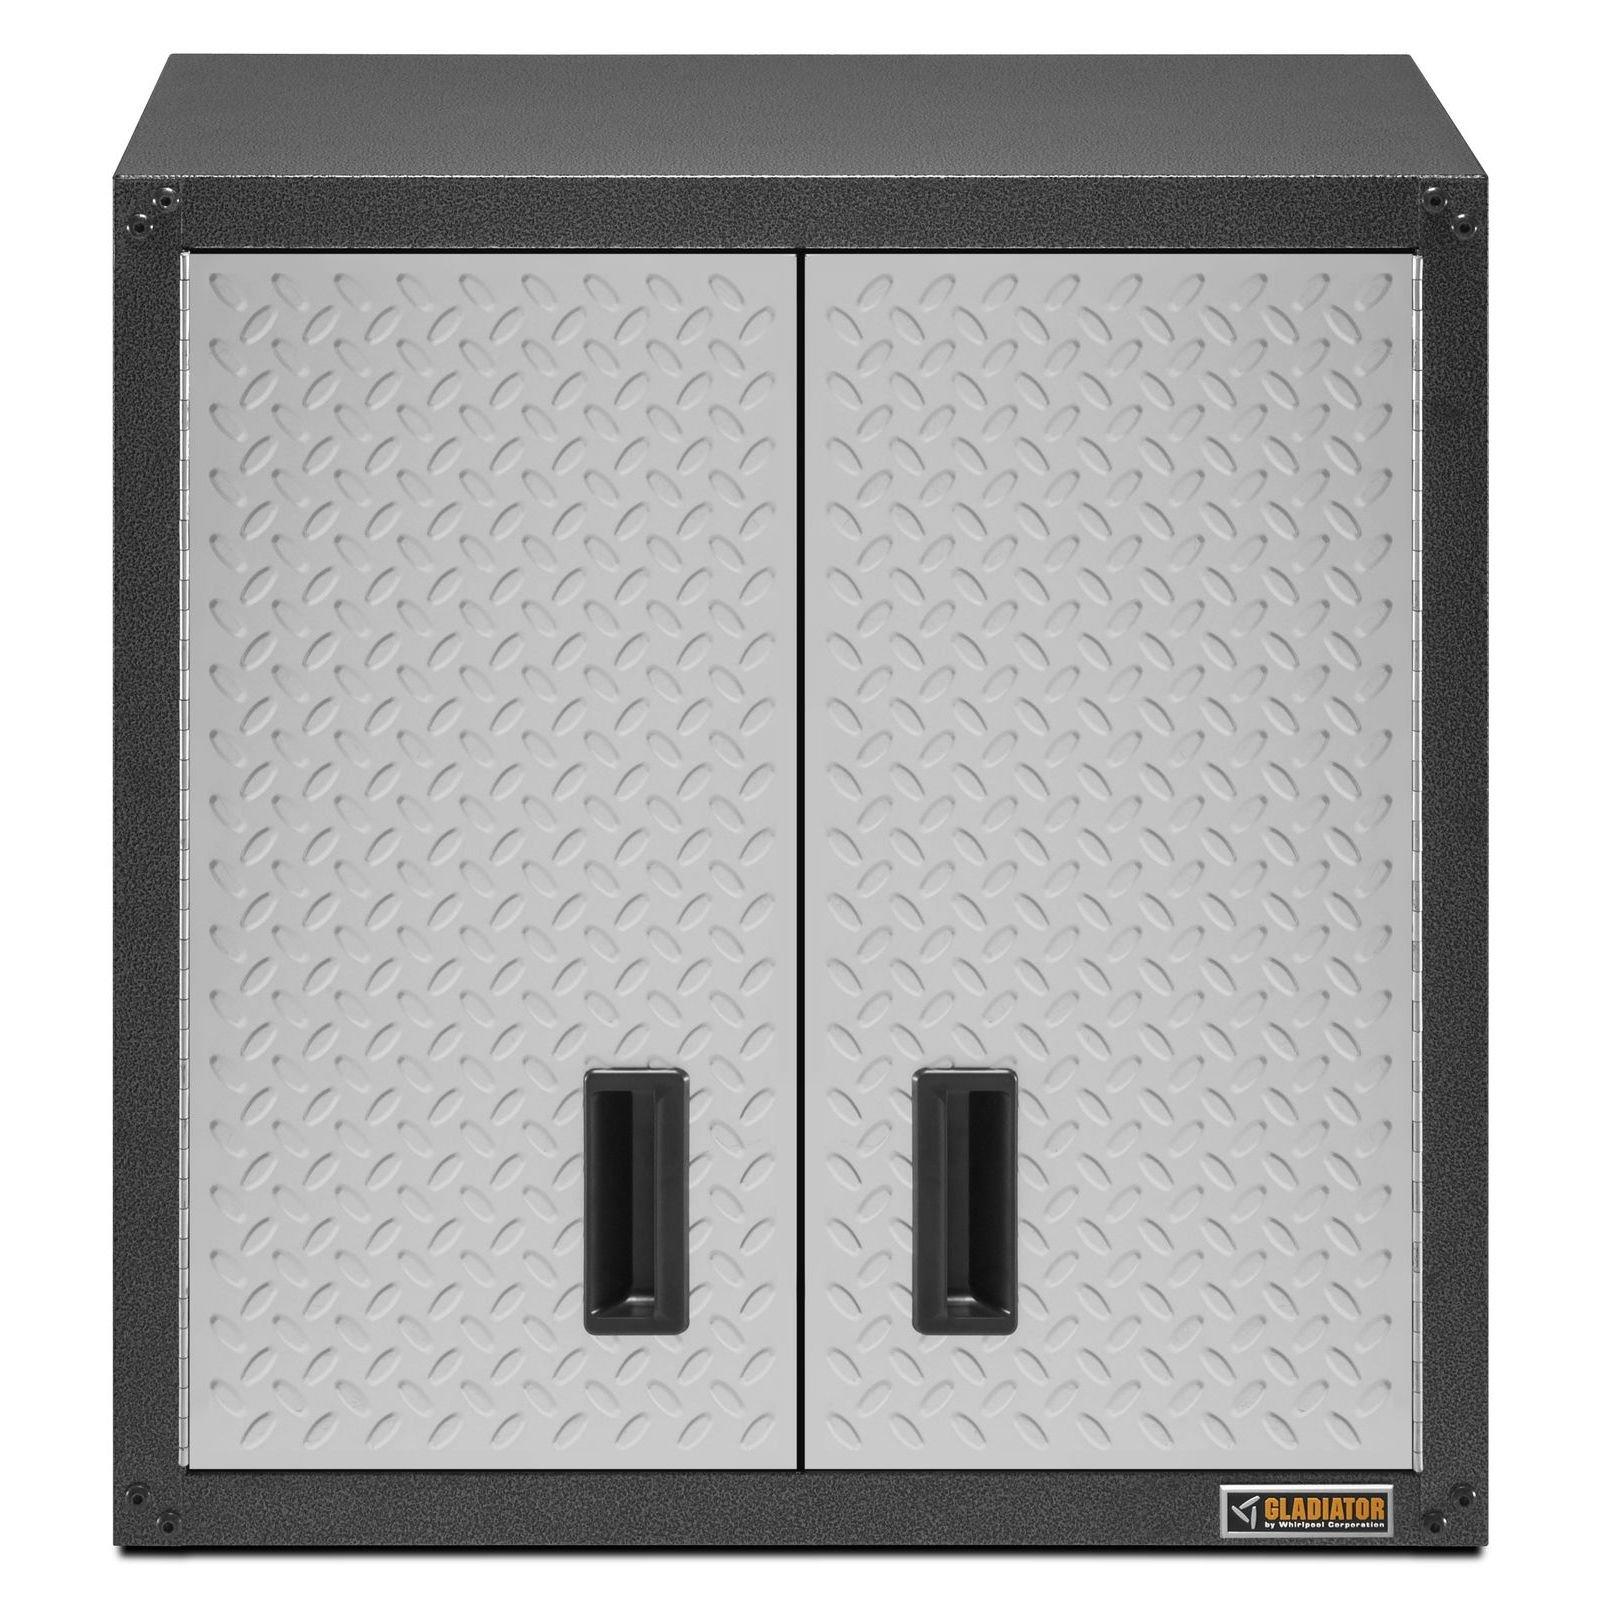 Gladiator GAWG28FDYG Full-Door Wall GearBox Steel Cabinet by Gladiator